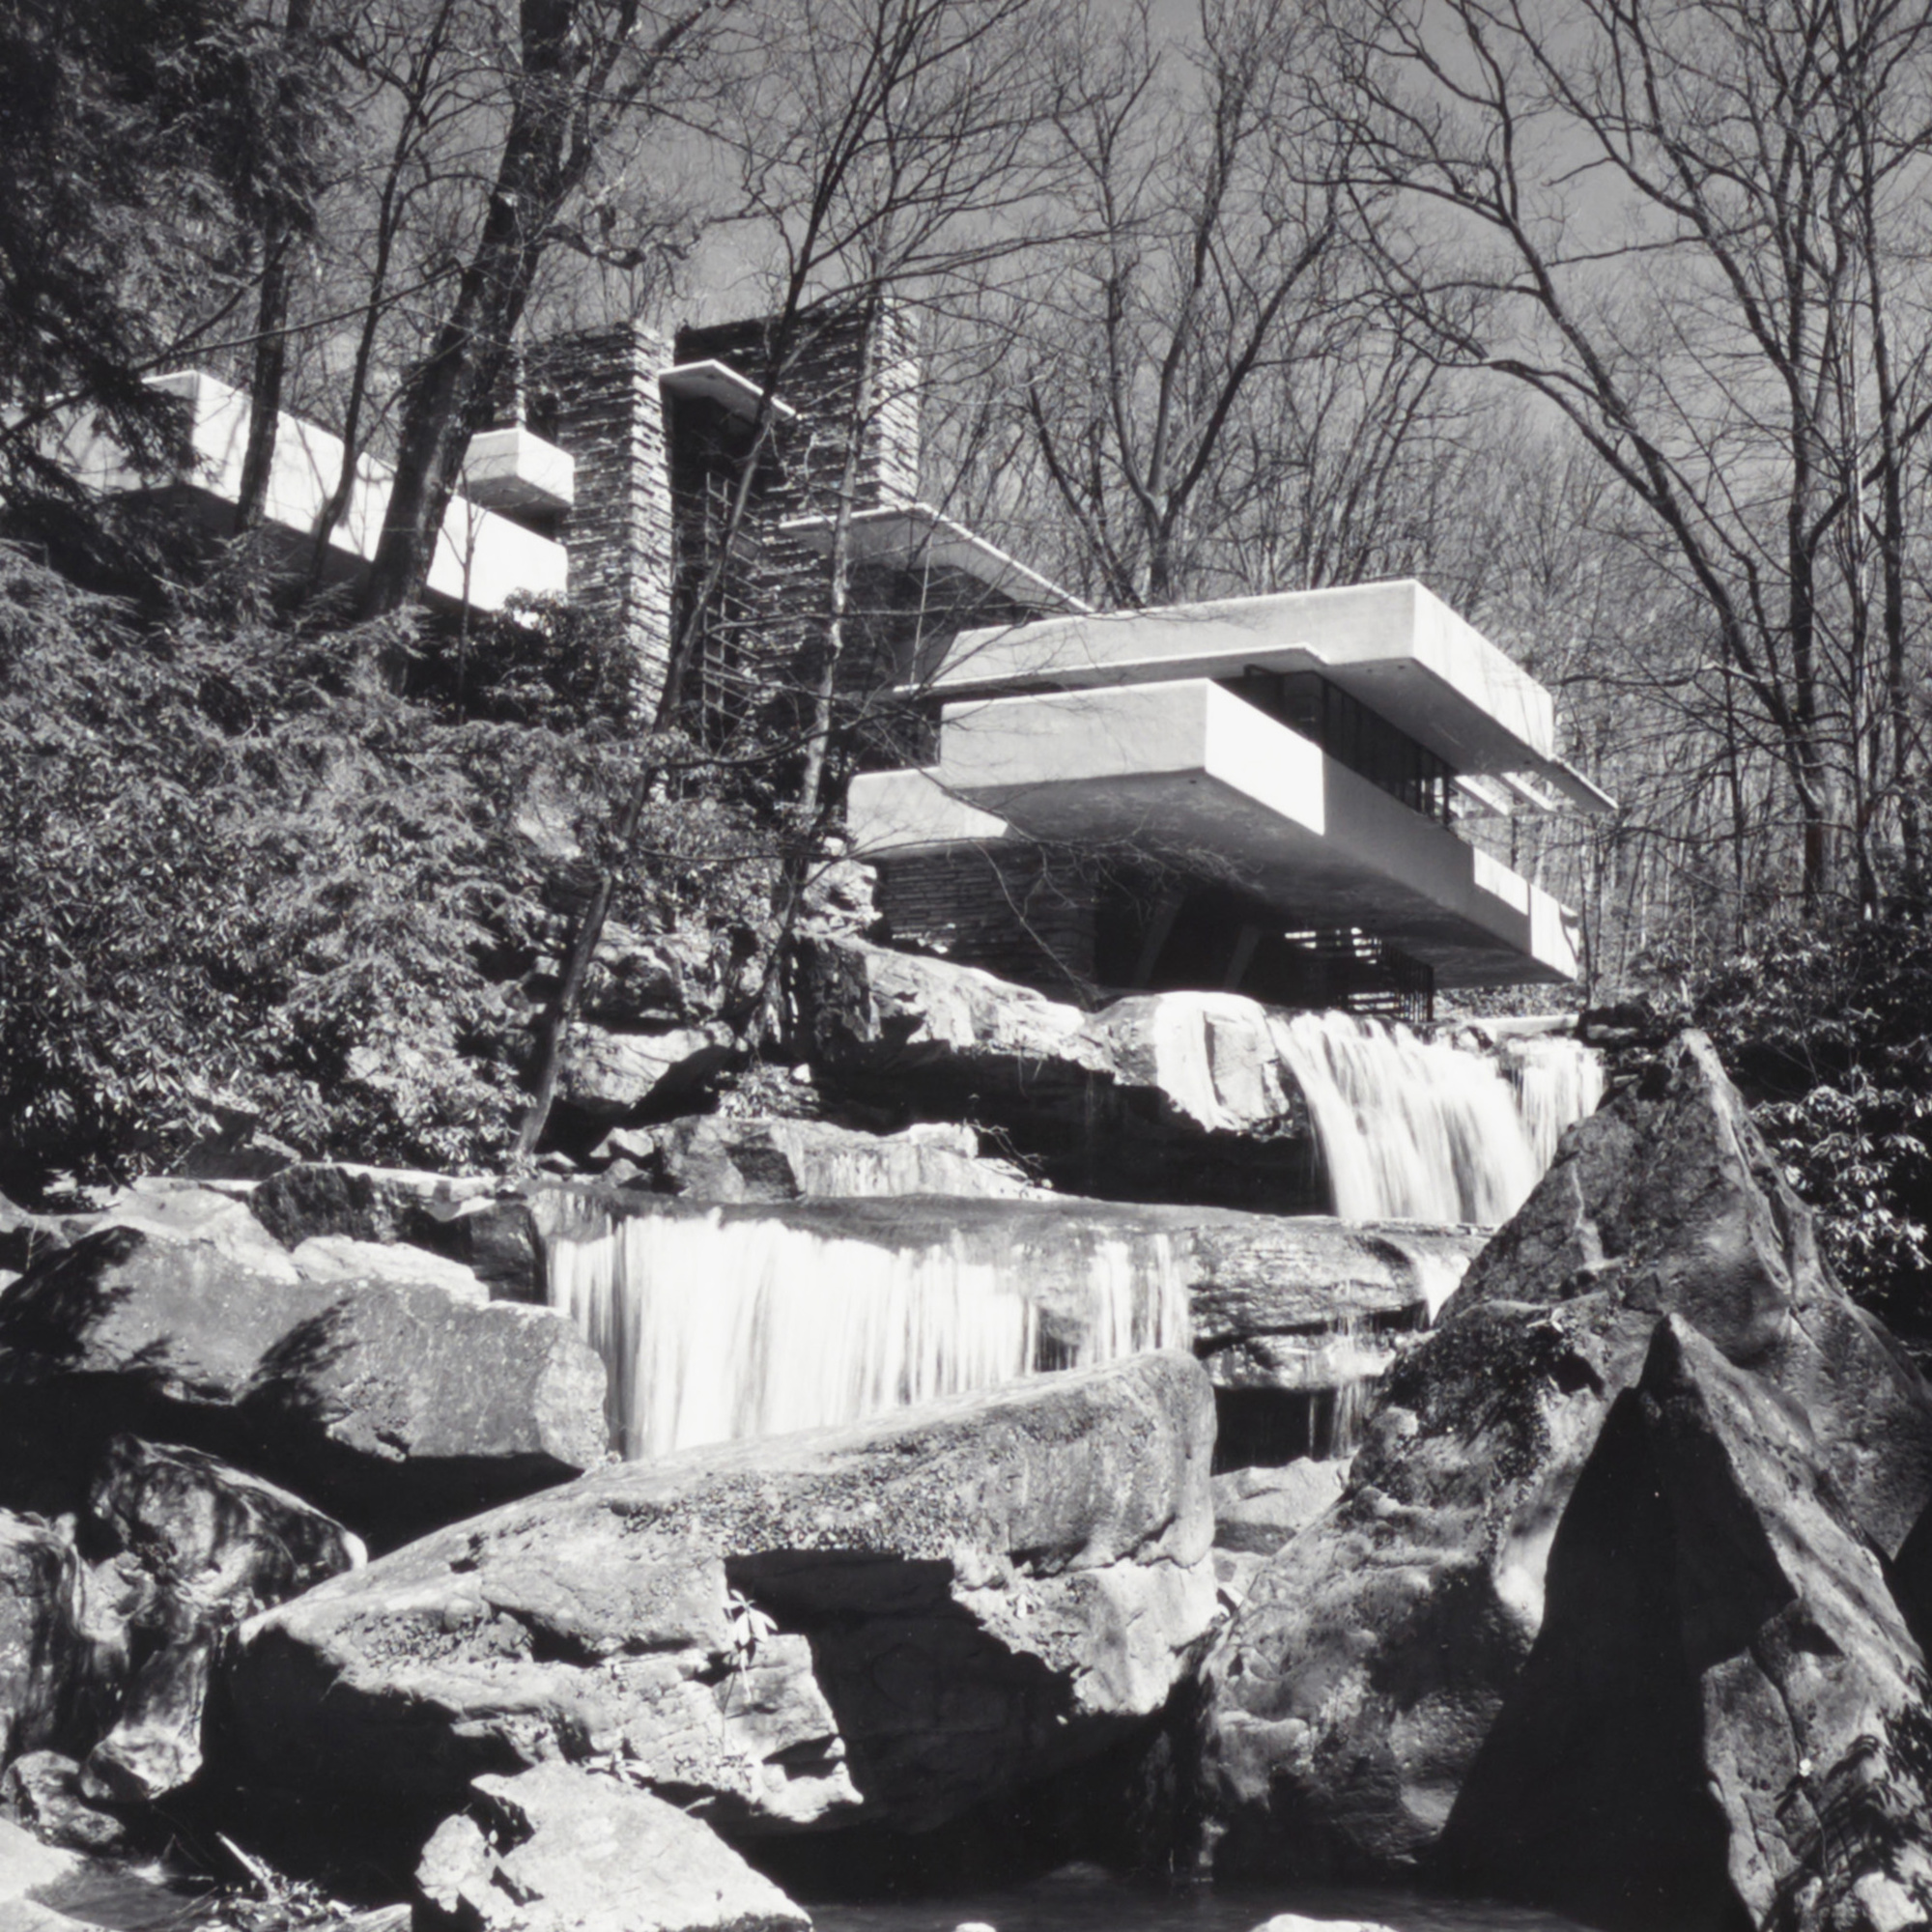 240: Ezra Stoller / Frank Lloyd Wright: Fallingwater, Bear Run, PA (with Jacques Lipchitz) (2 of 2)